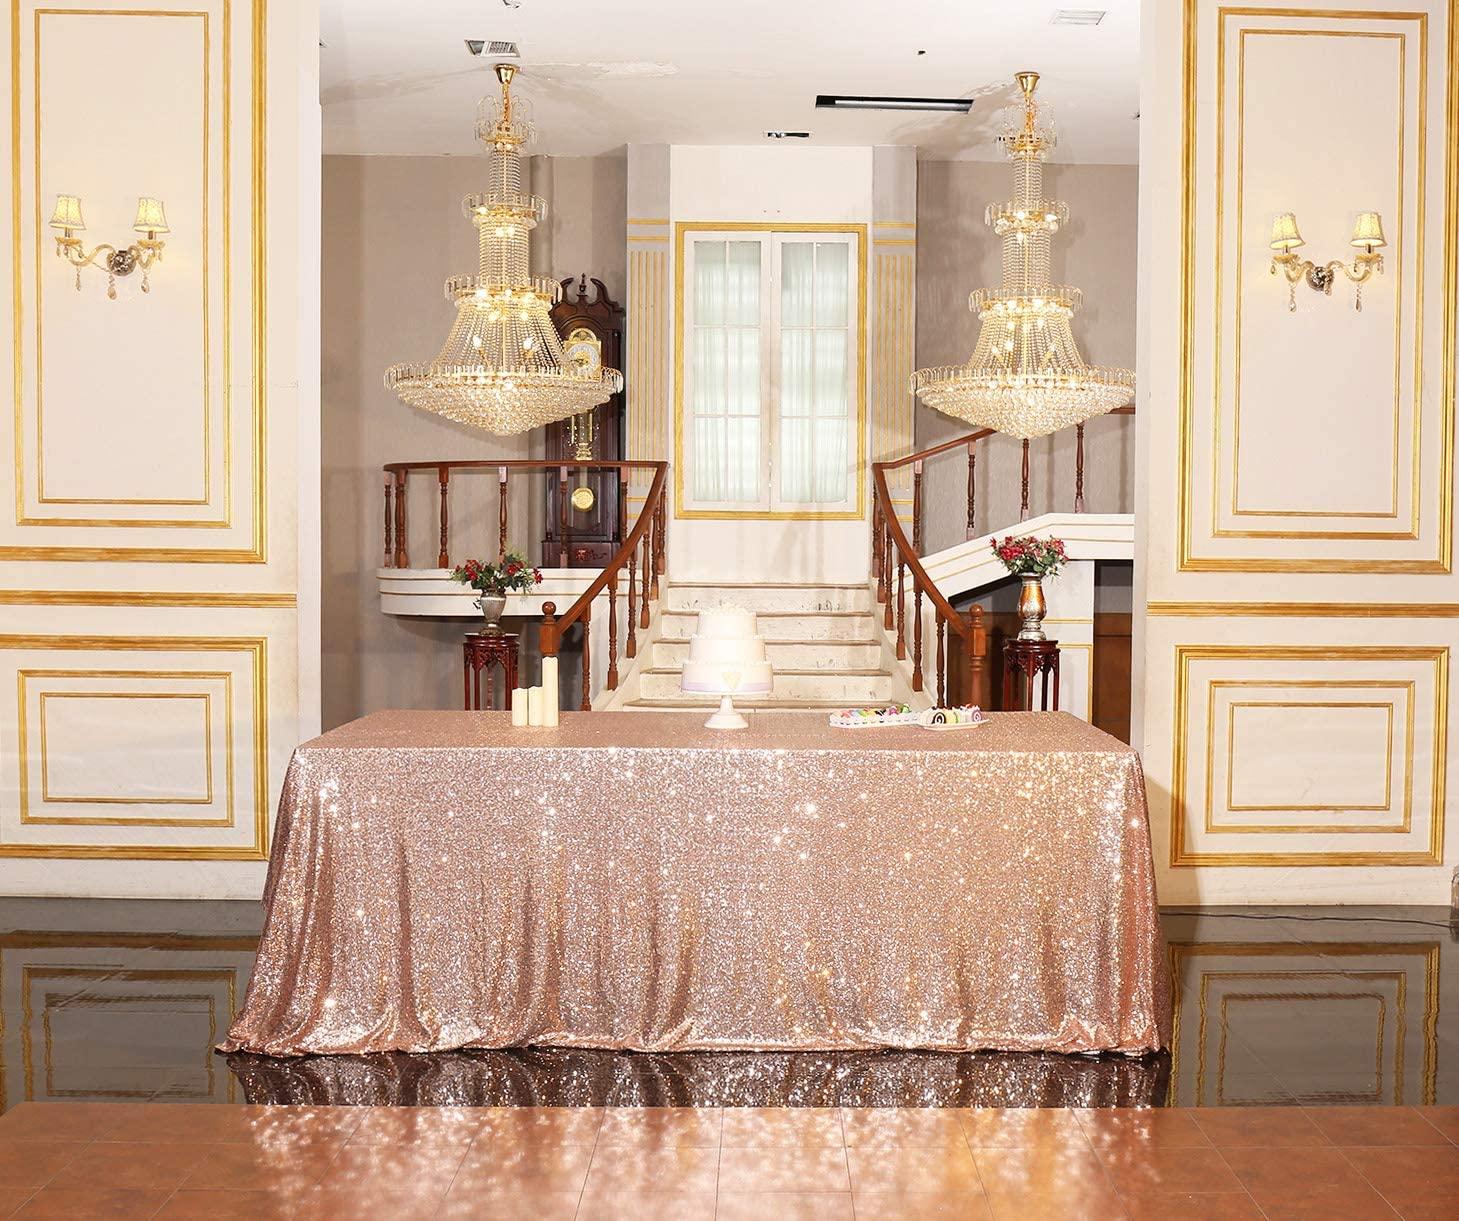 PartyDelight Sequin Tablecloth, Rectangular, 60